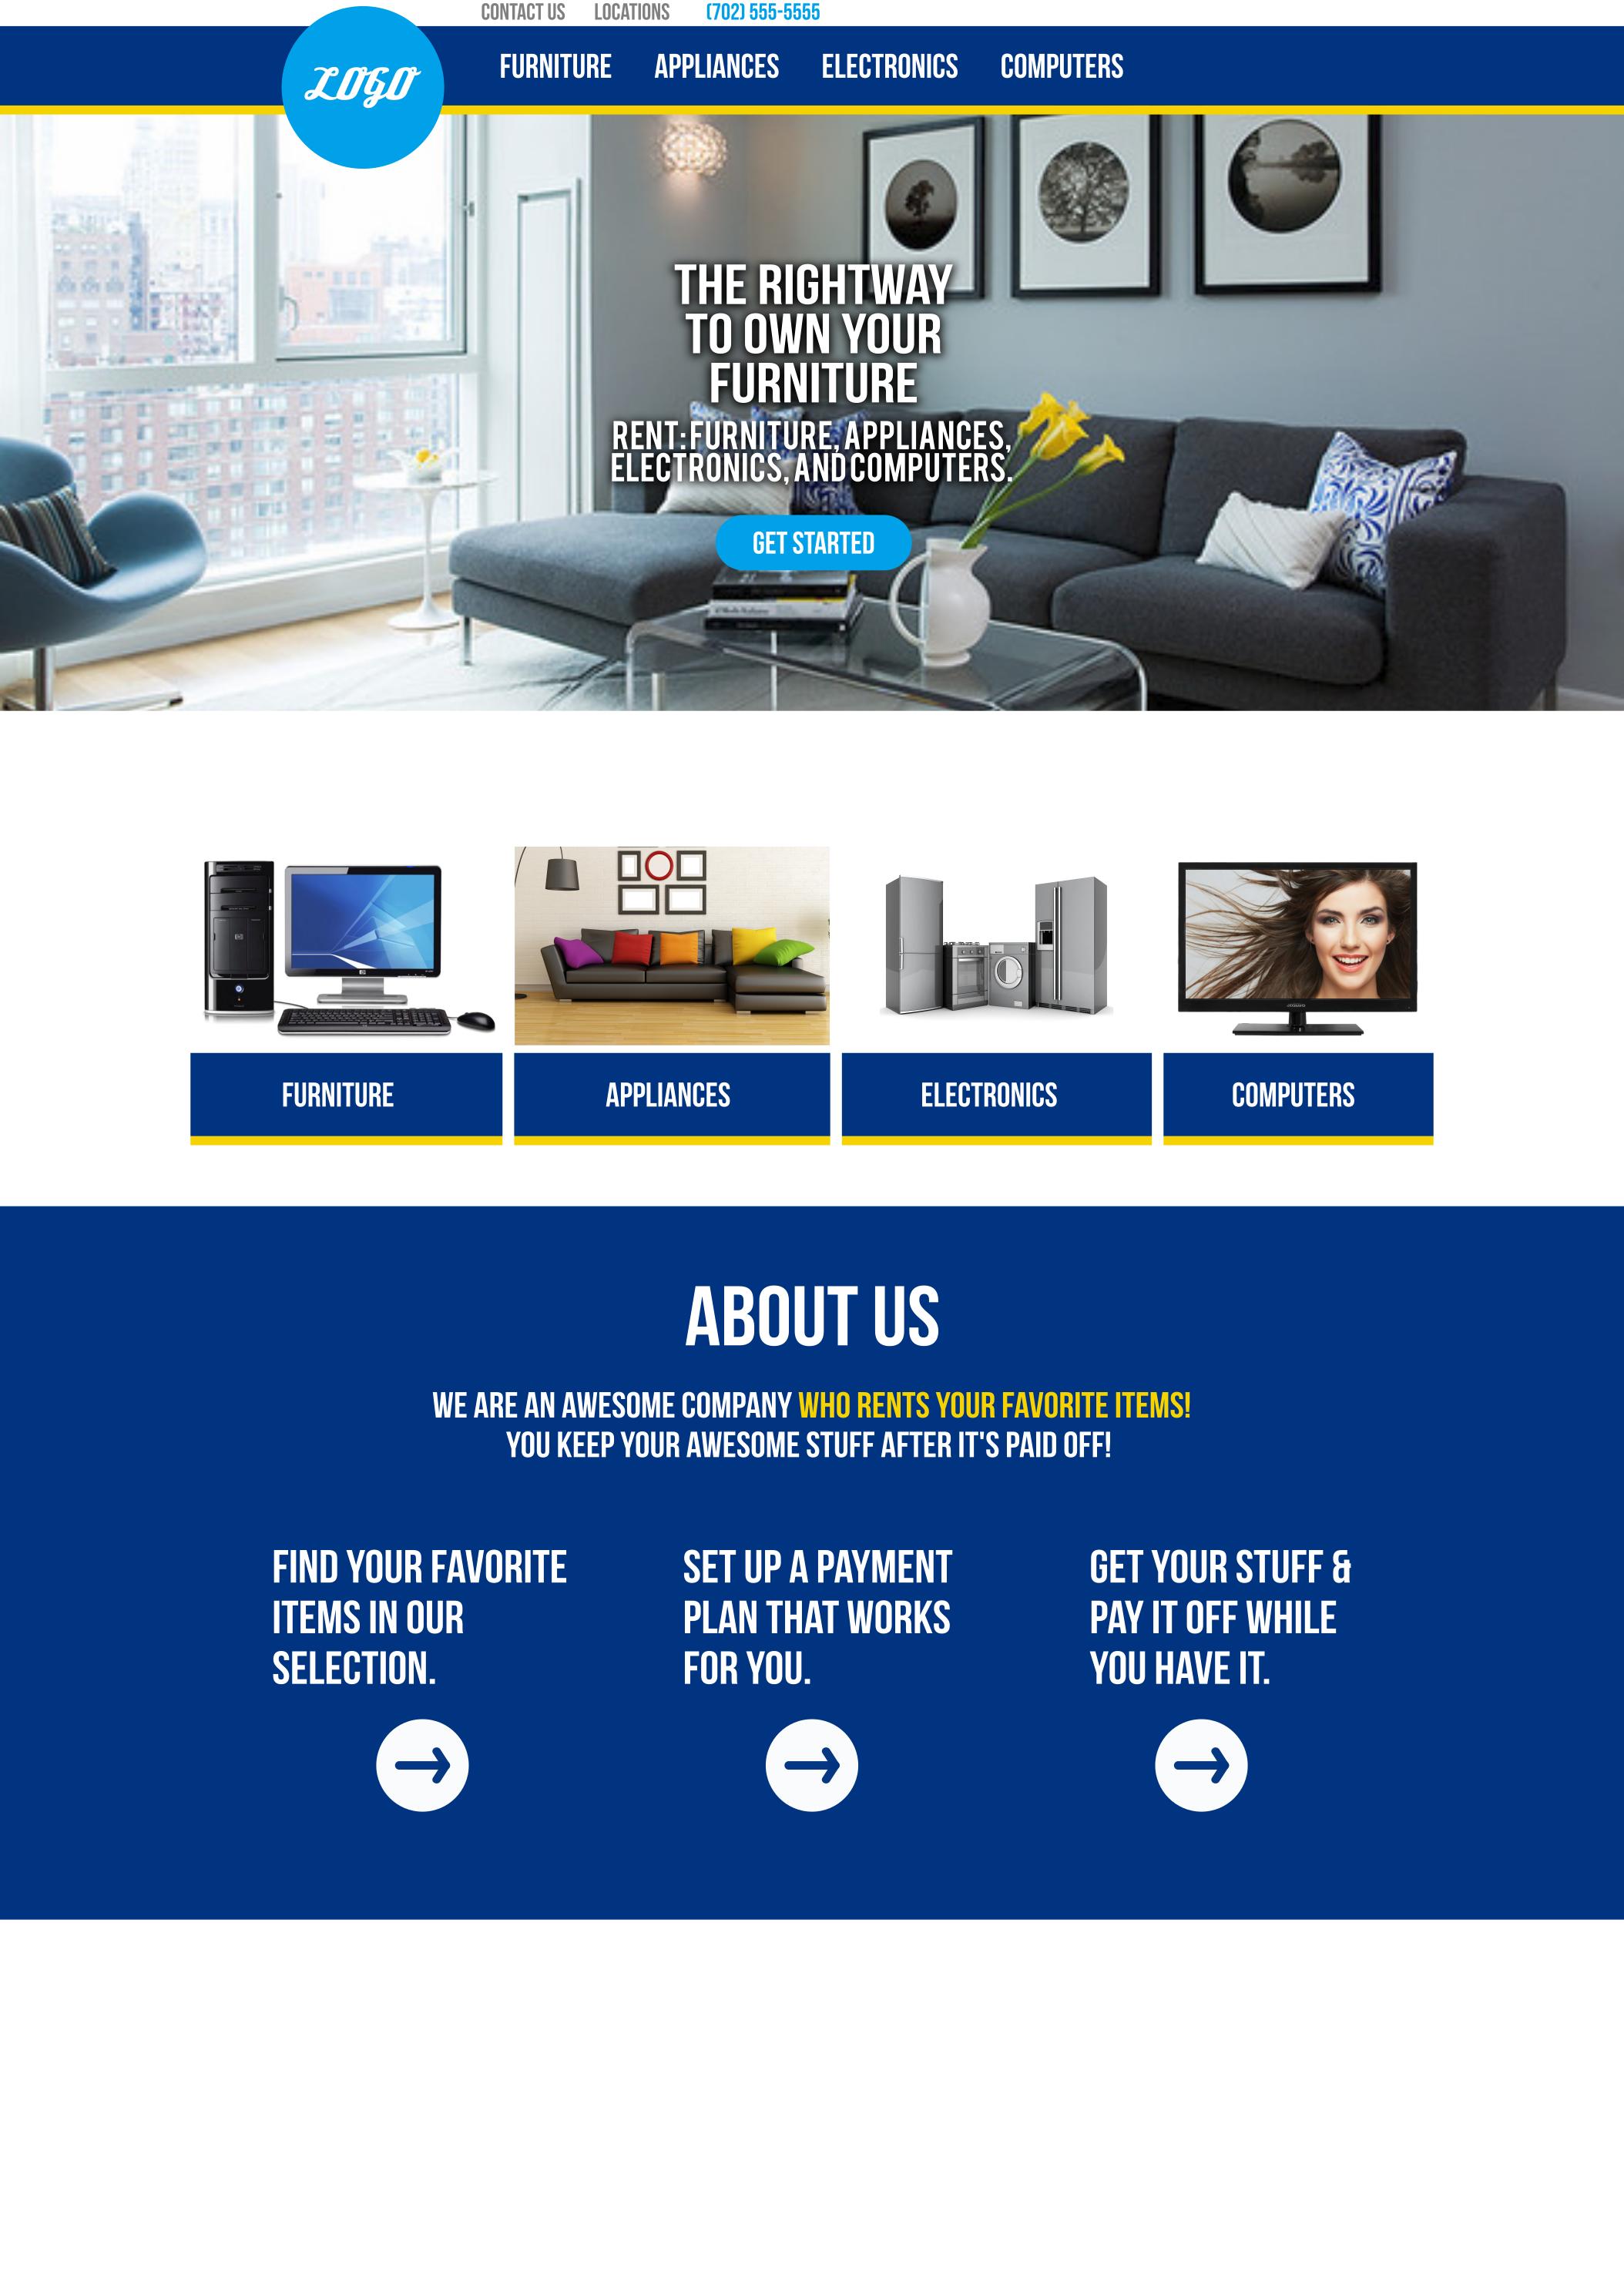 Rightway Furniture   Website Mockup1